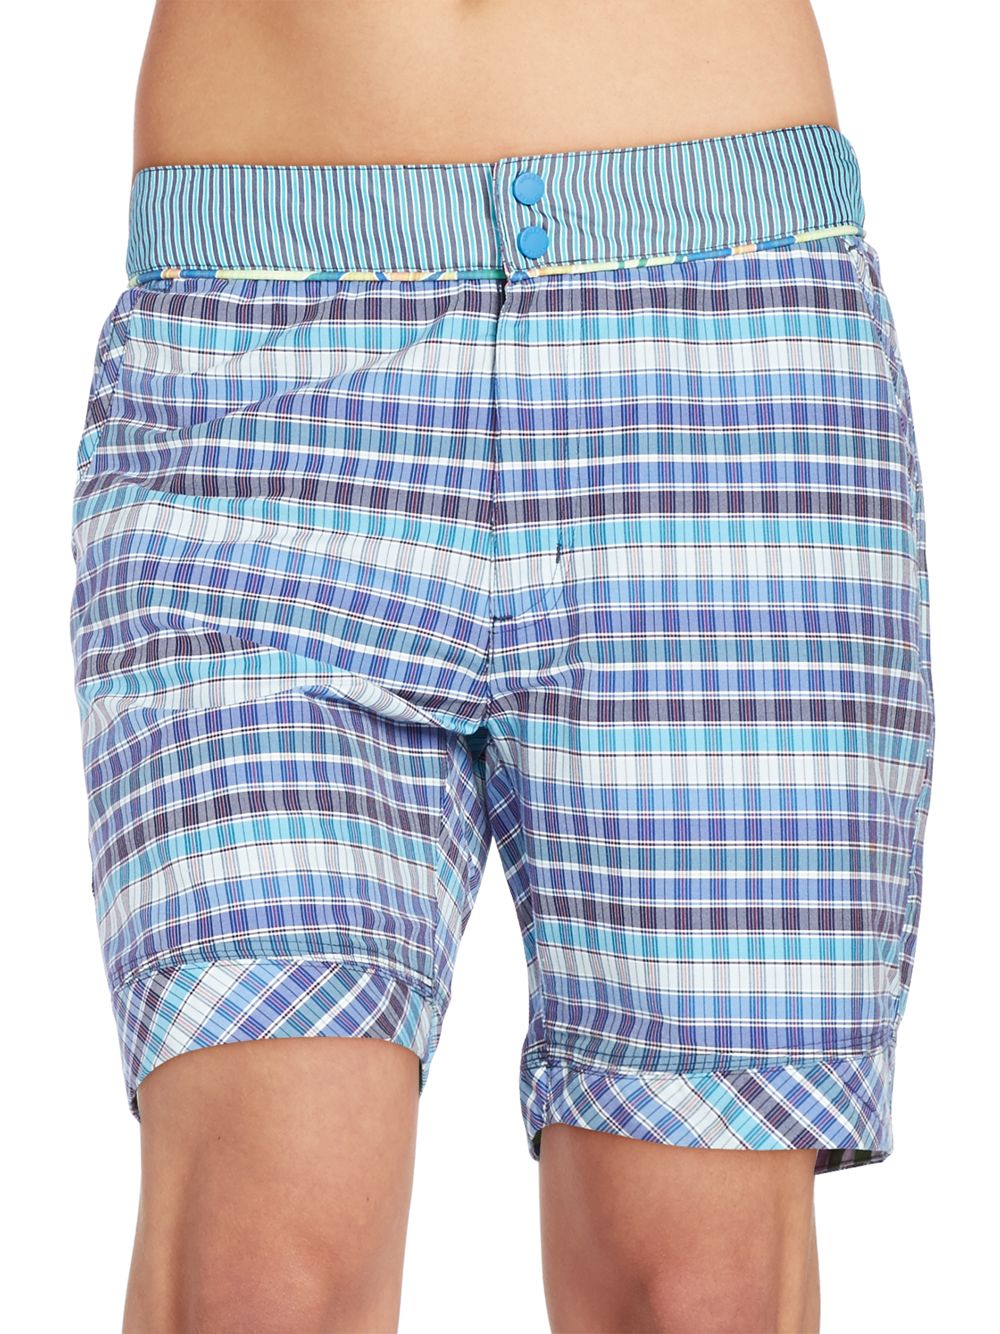 cdc1d6a8a9 Robert Graham Tonga Swim Trunks in Blue for Men - Lyst